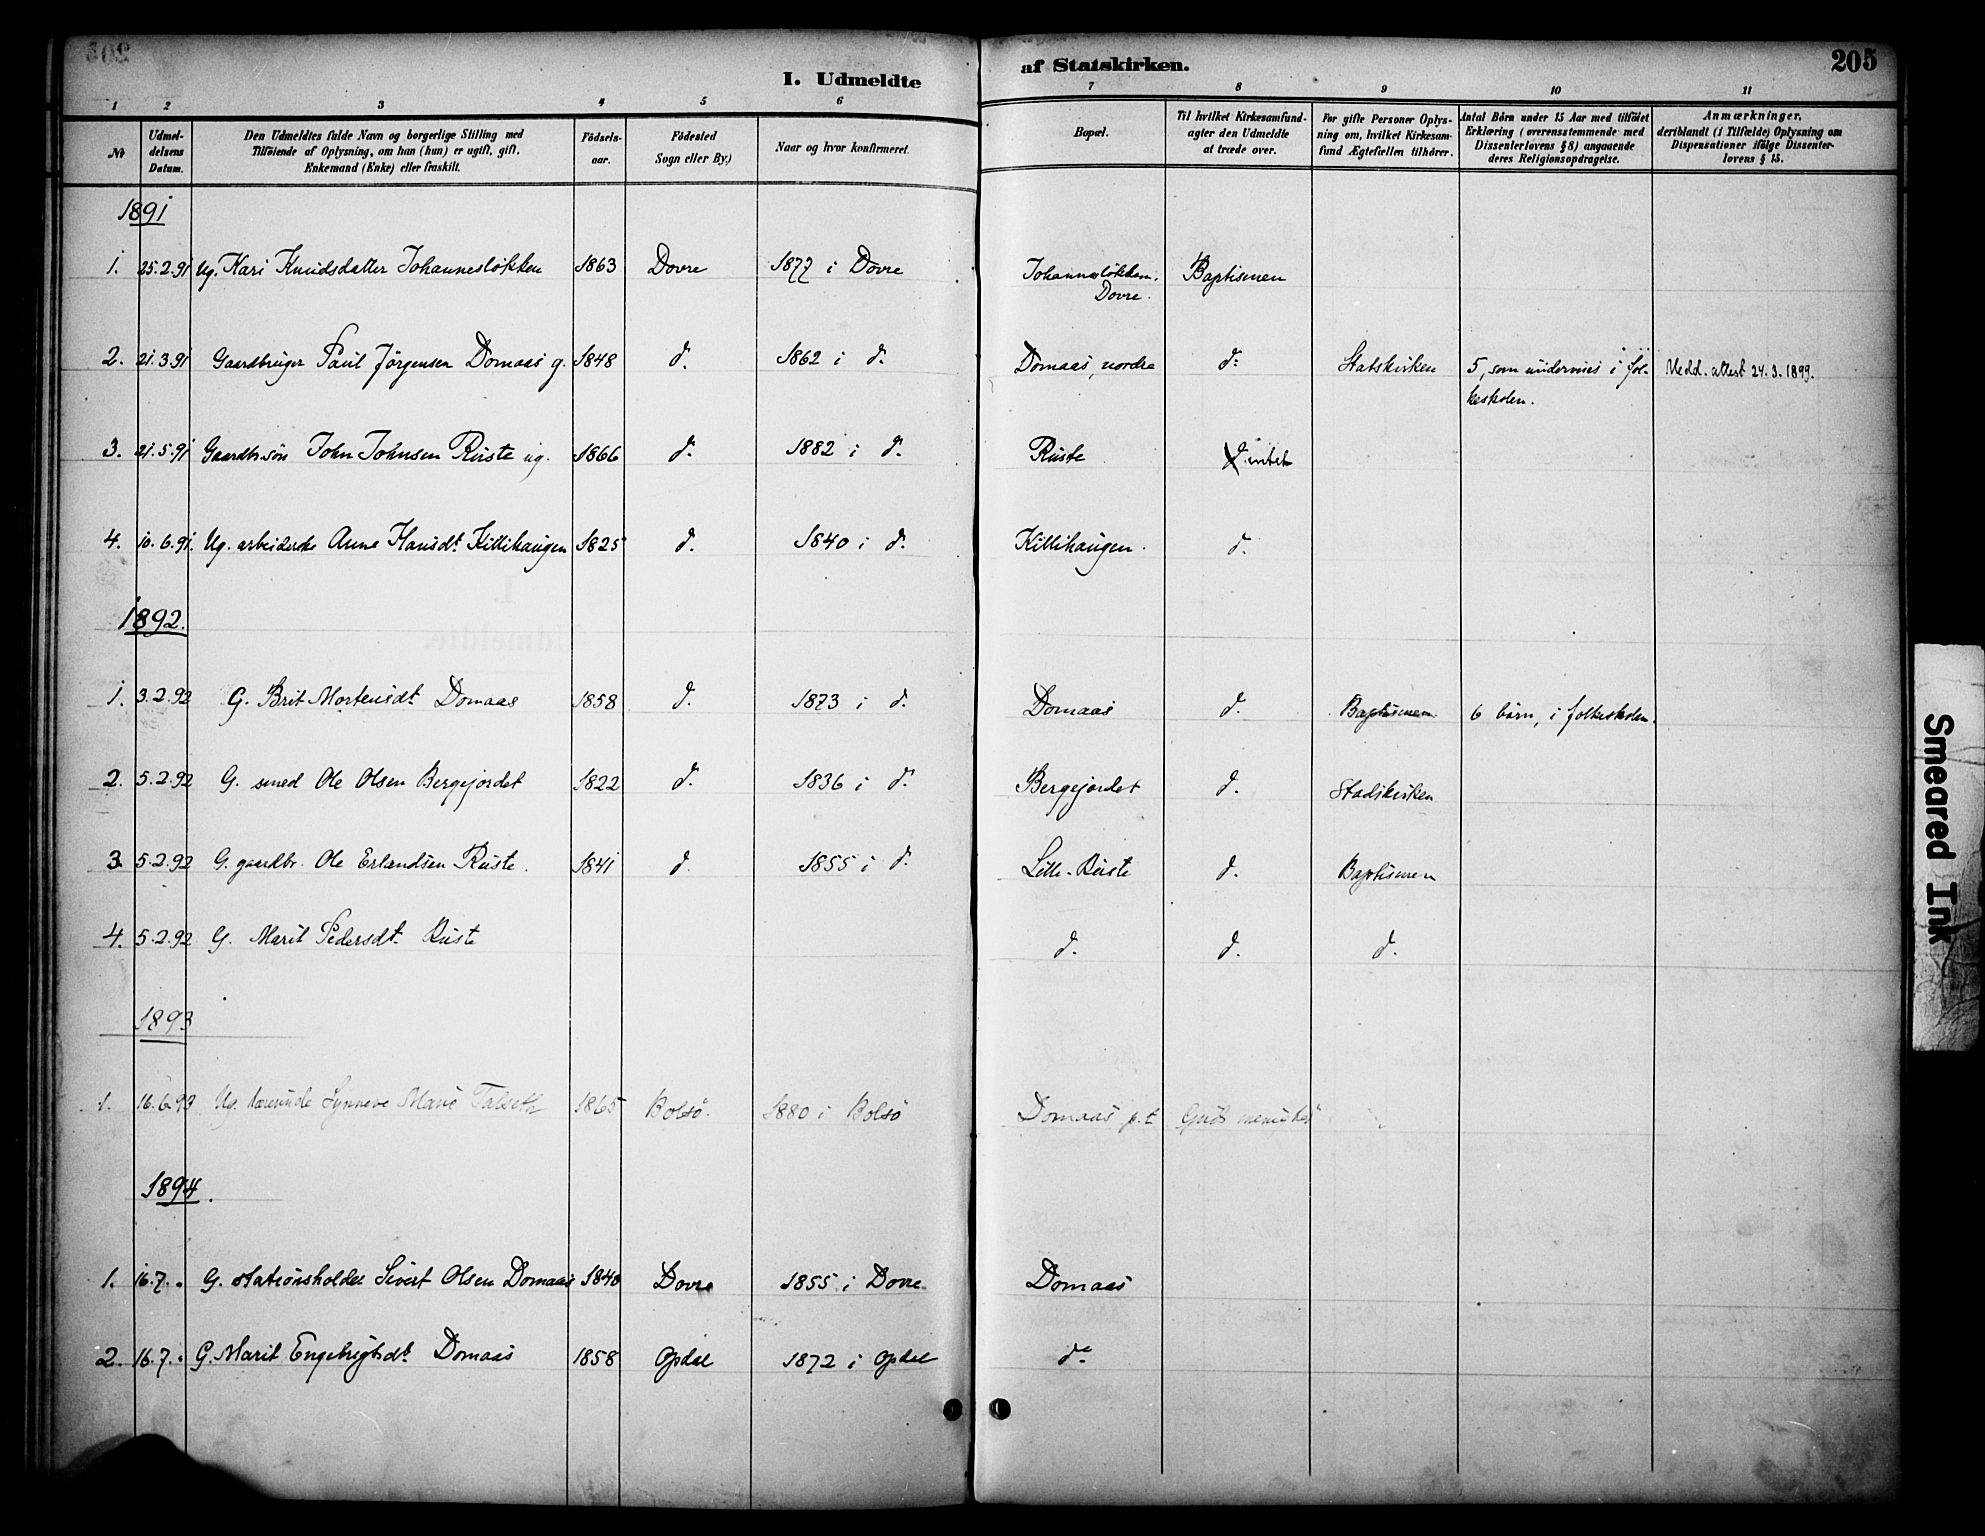 SAH, Dovre prestekontor, Ministerialbok nr. 3, 1891-1901, s. 205